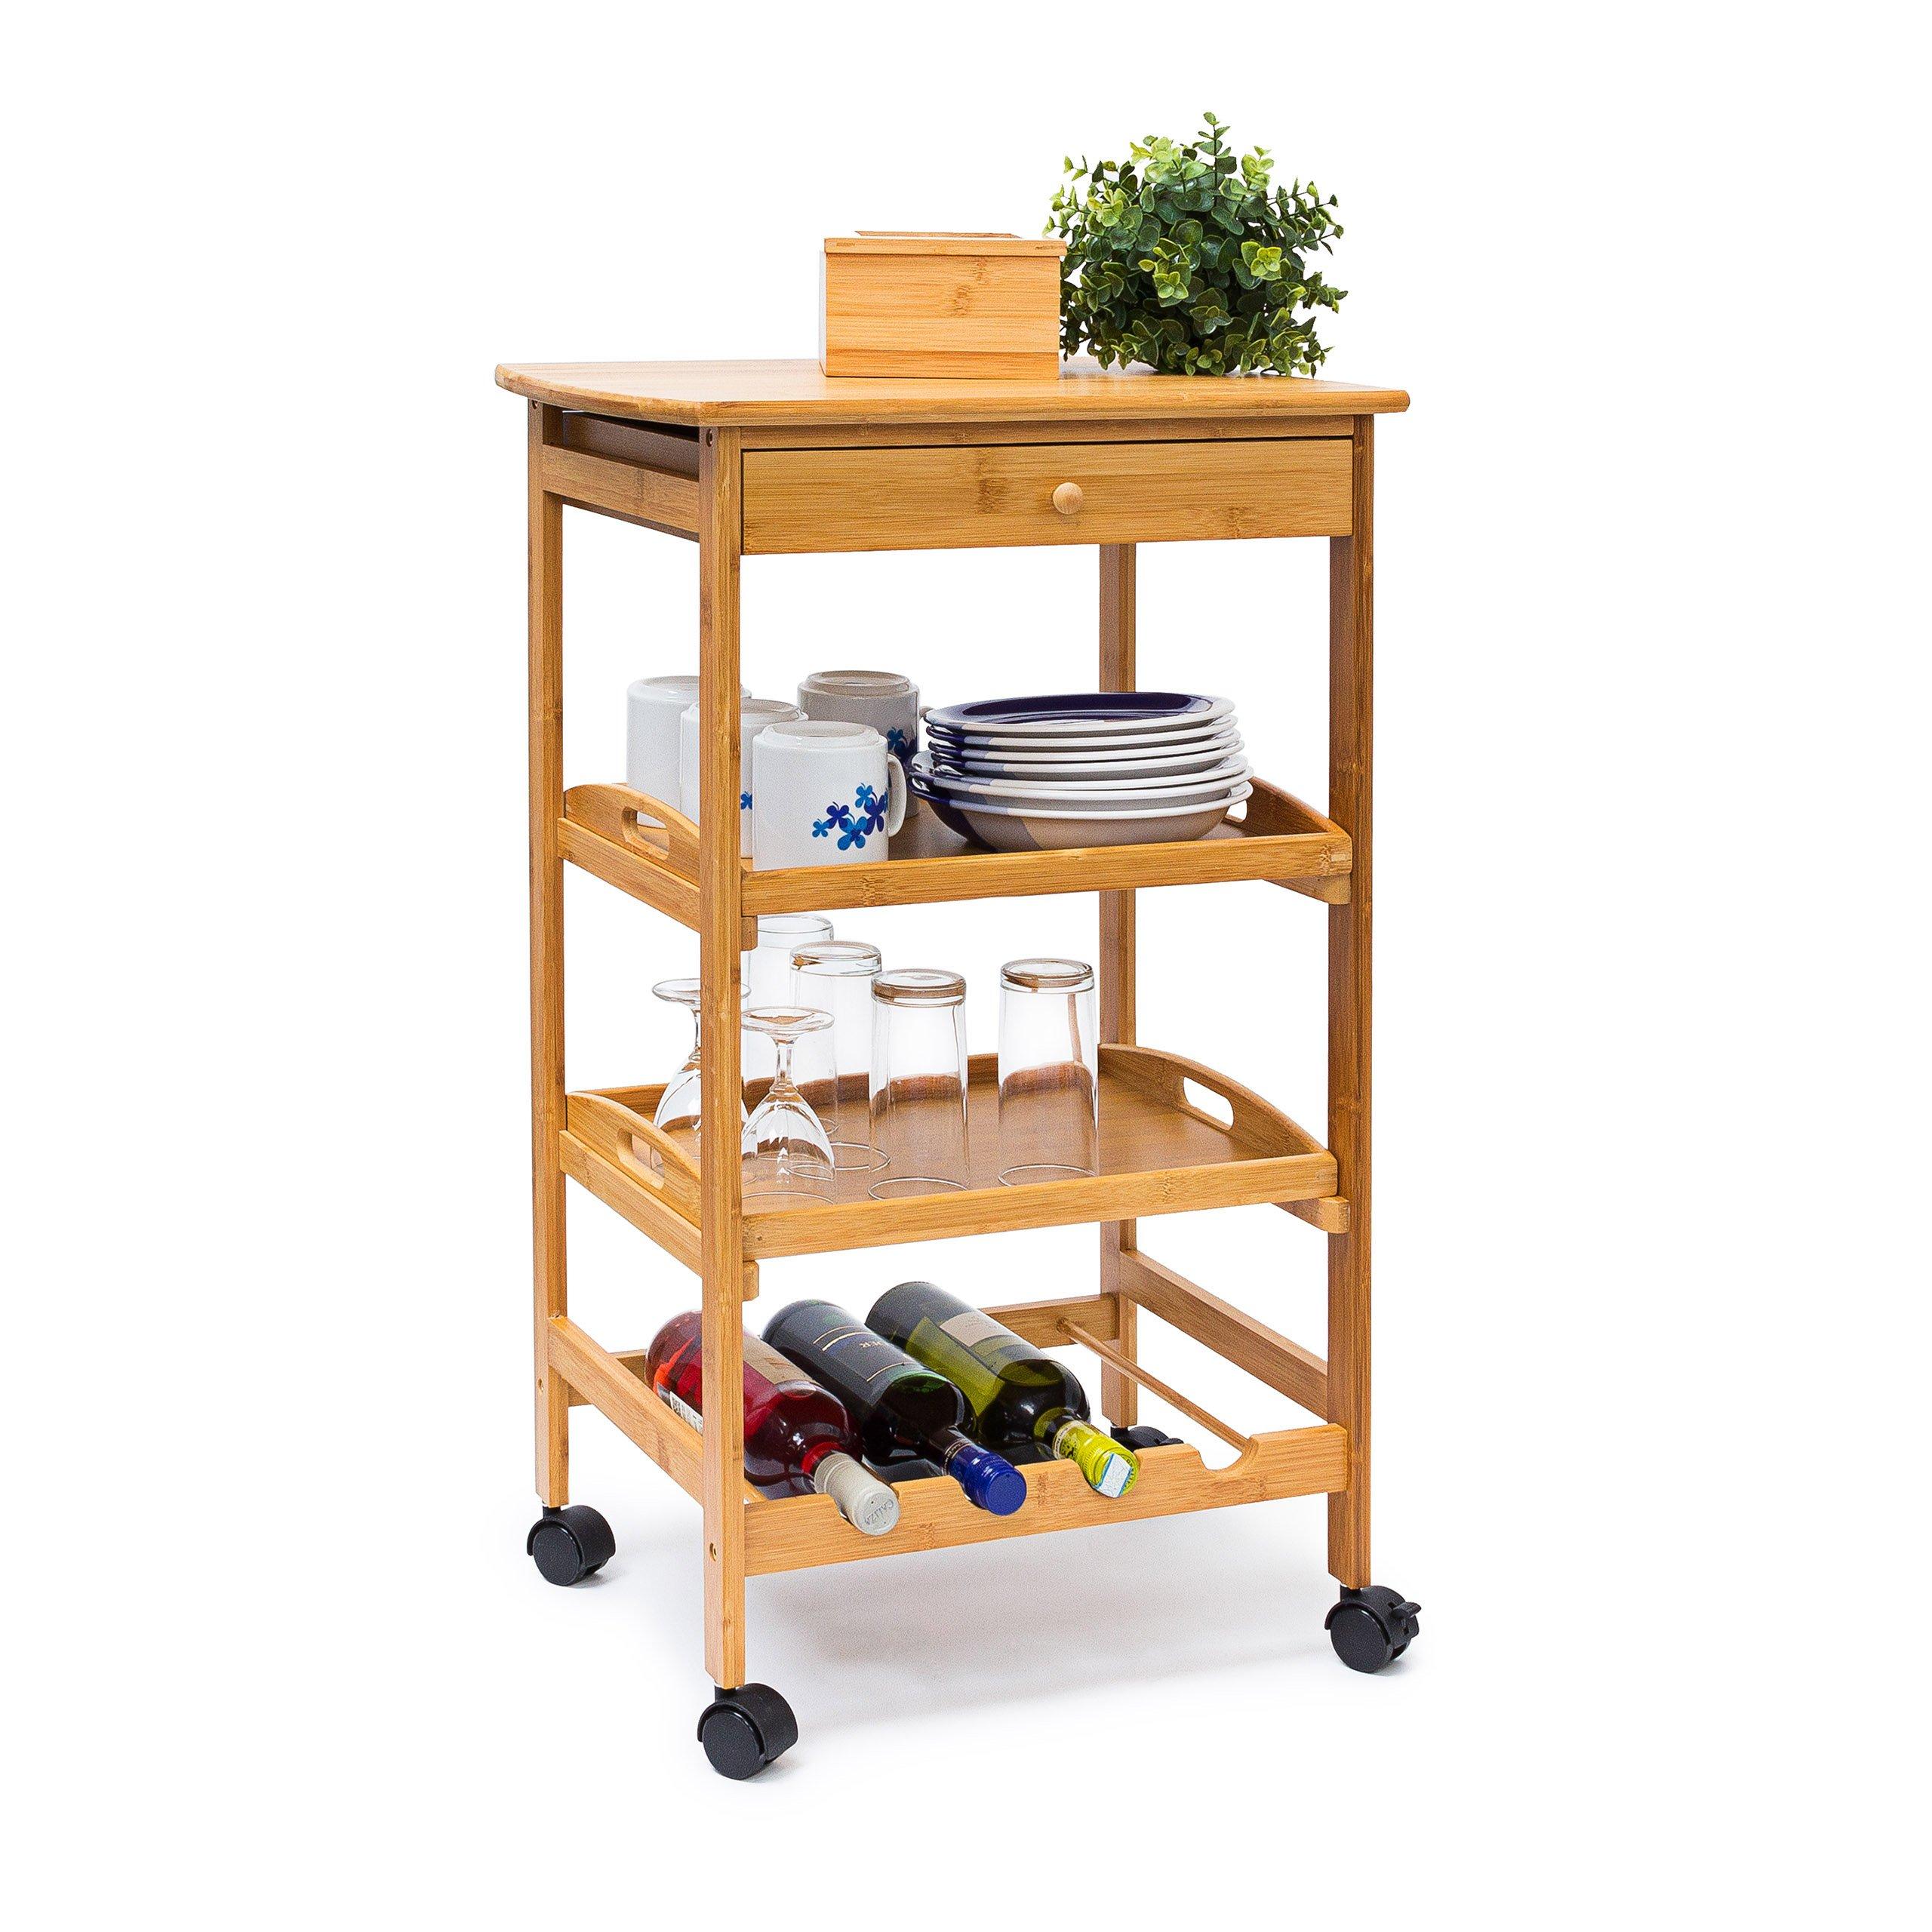 Rolling storage kitchen rolling shelves shelf wheels cart shelving organisation